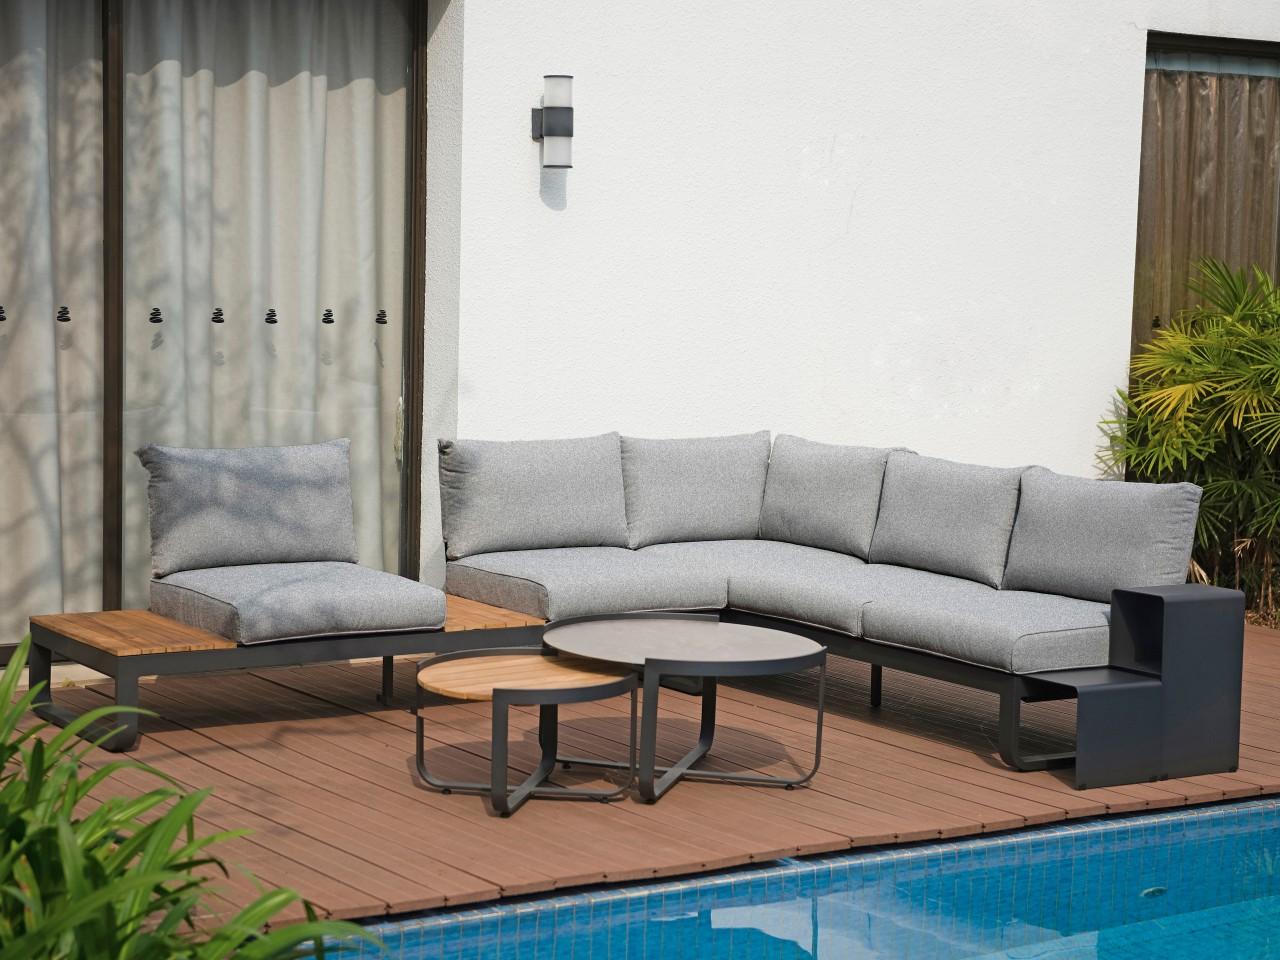 Zebra Gartenmöbel-Set Fly Lounge Mixed Grey